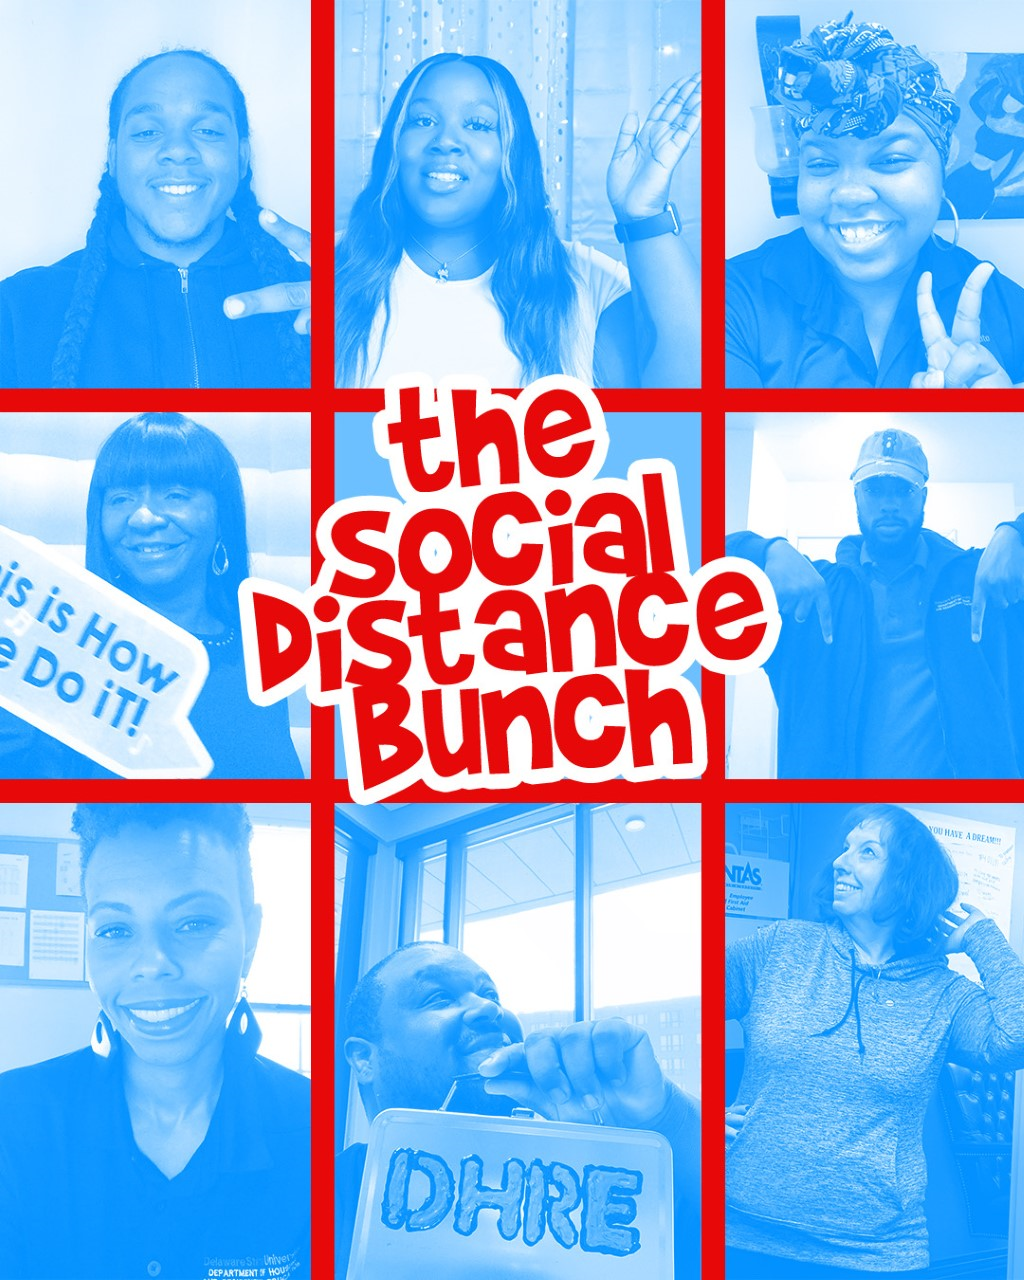 DHRE Social Distance Bunch